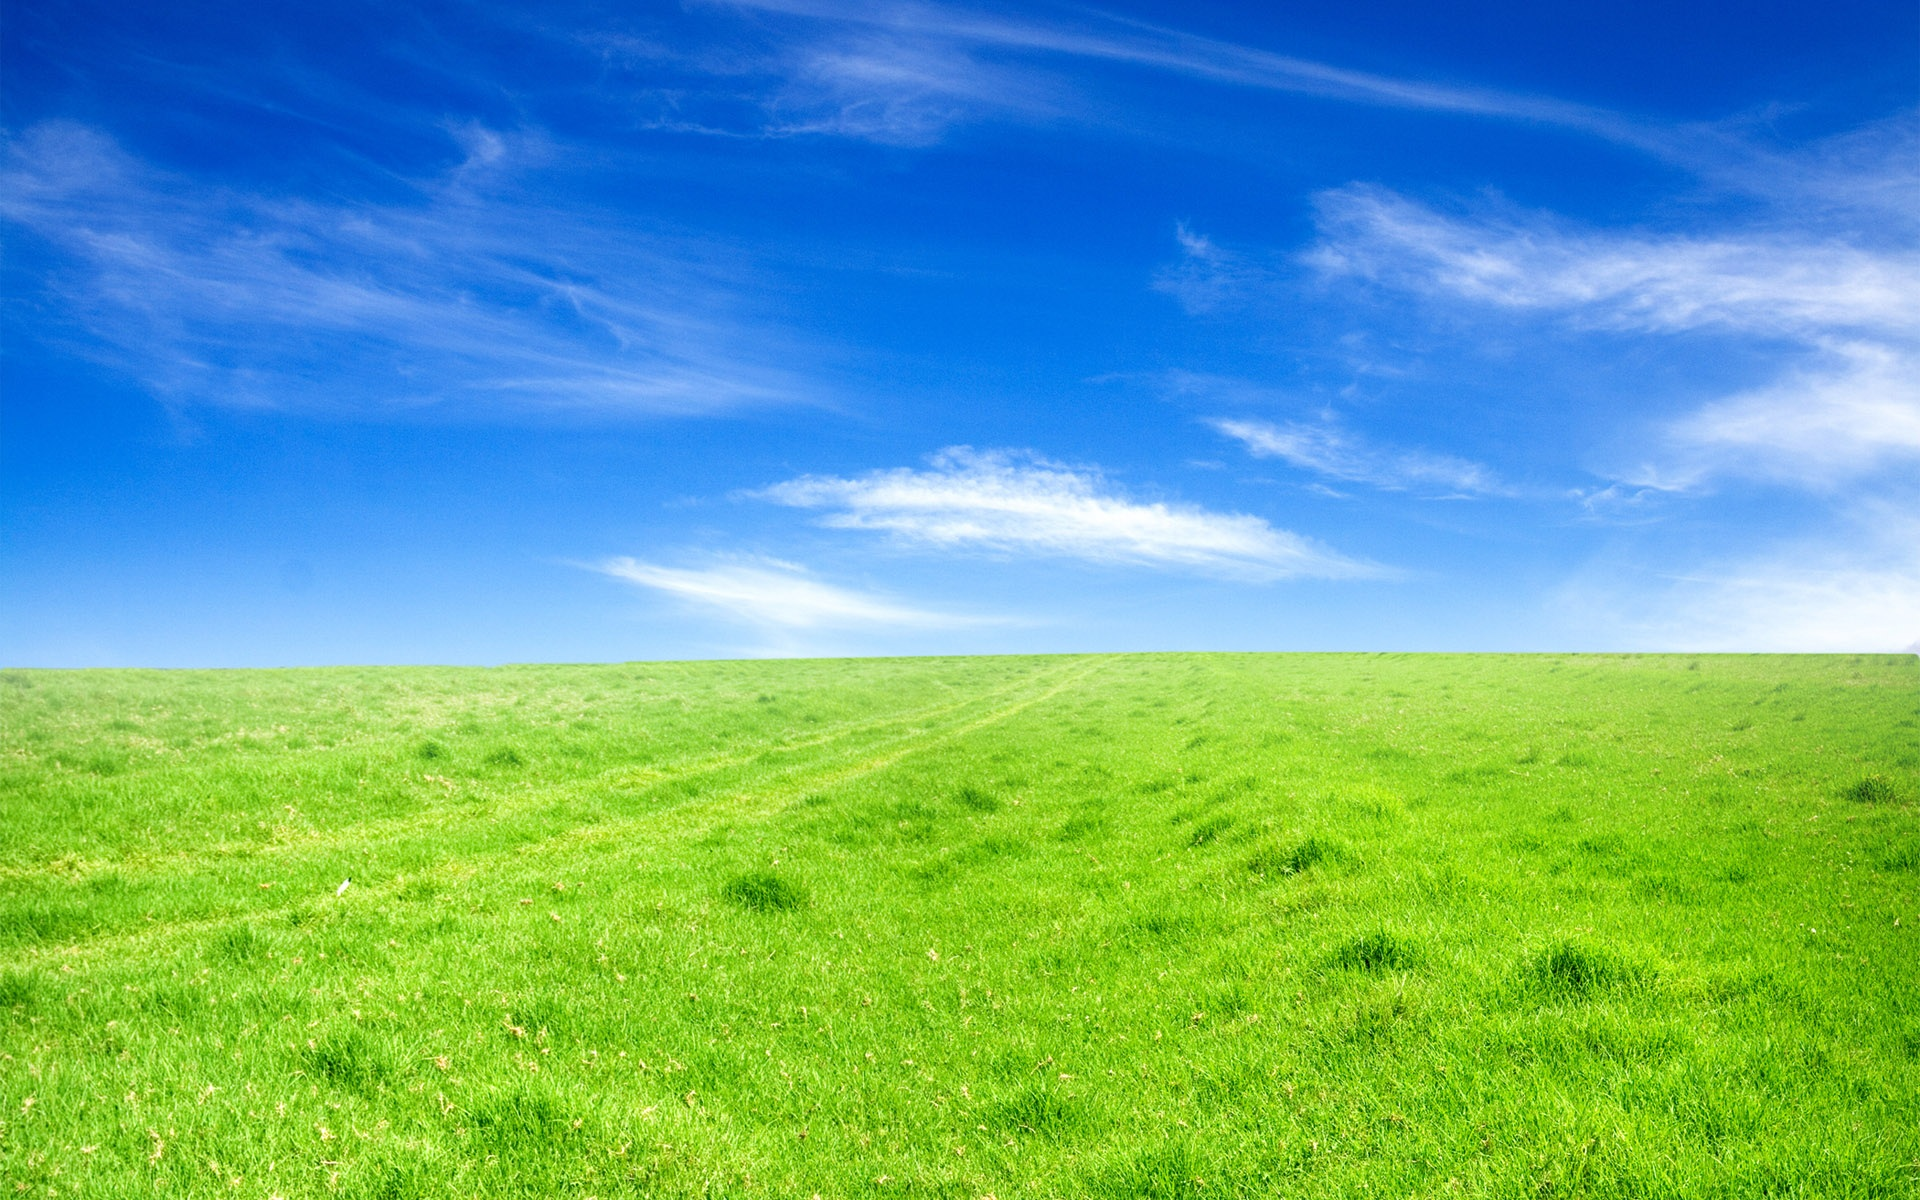 gr u00fcnes gras blauer himmel 1920x1200 hd hintergrundbilder  hd  bild